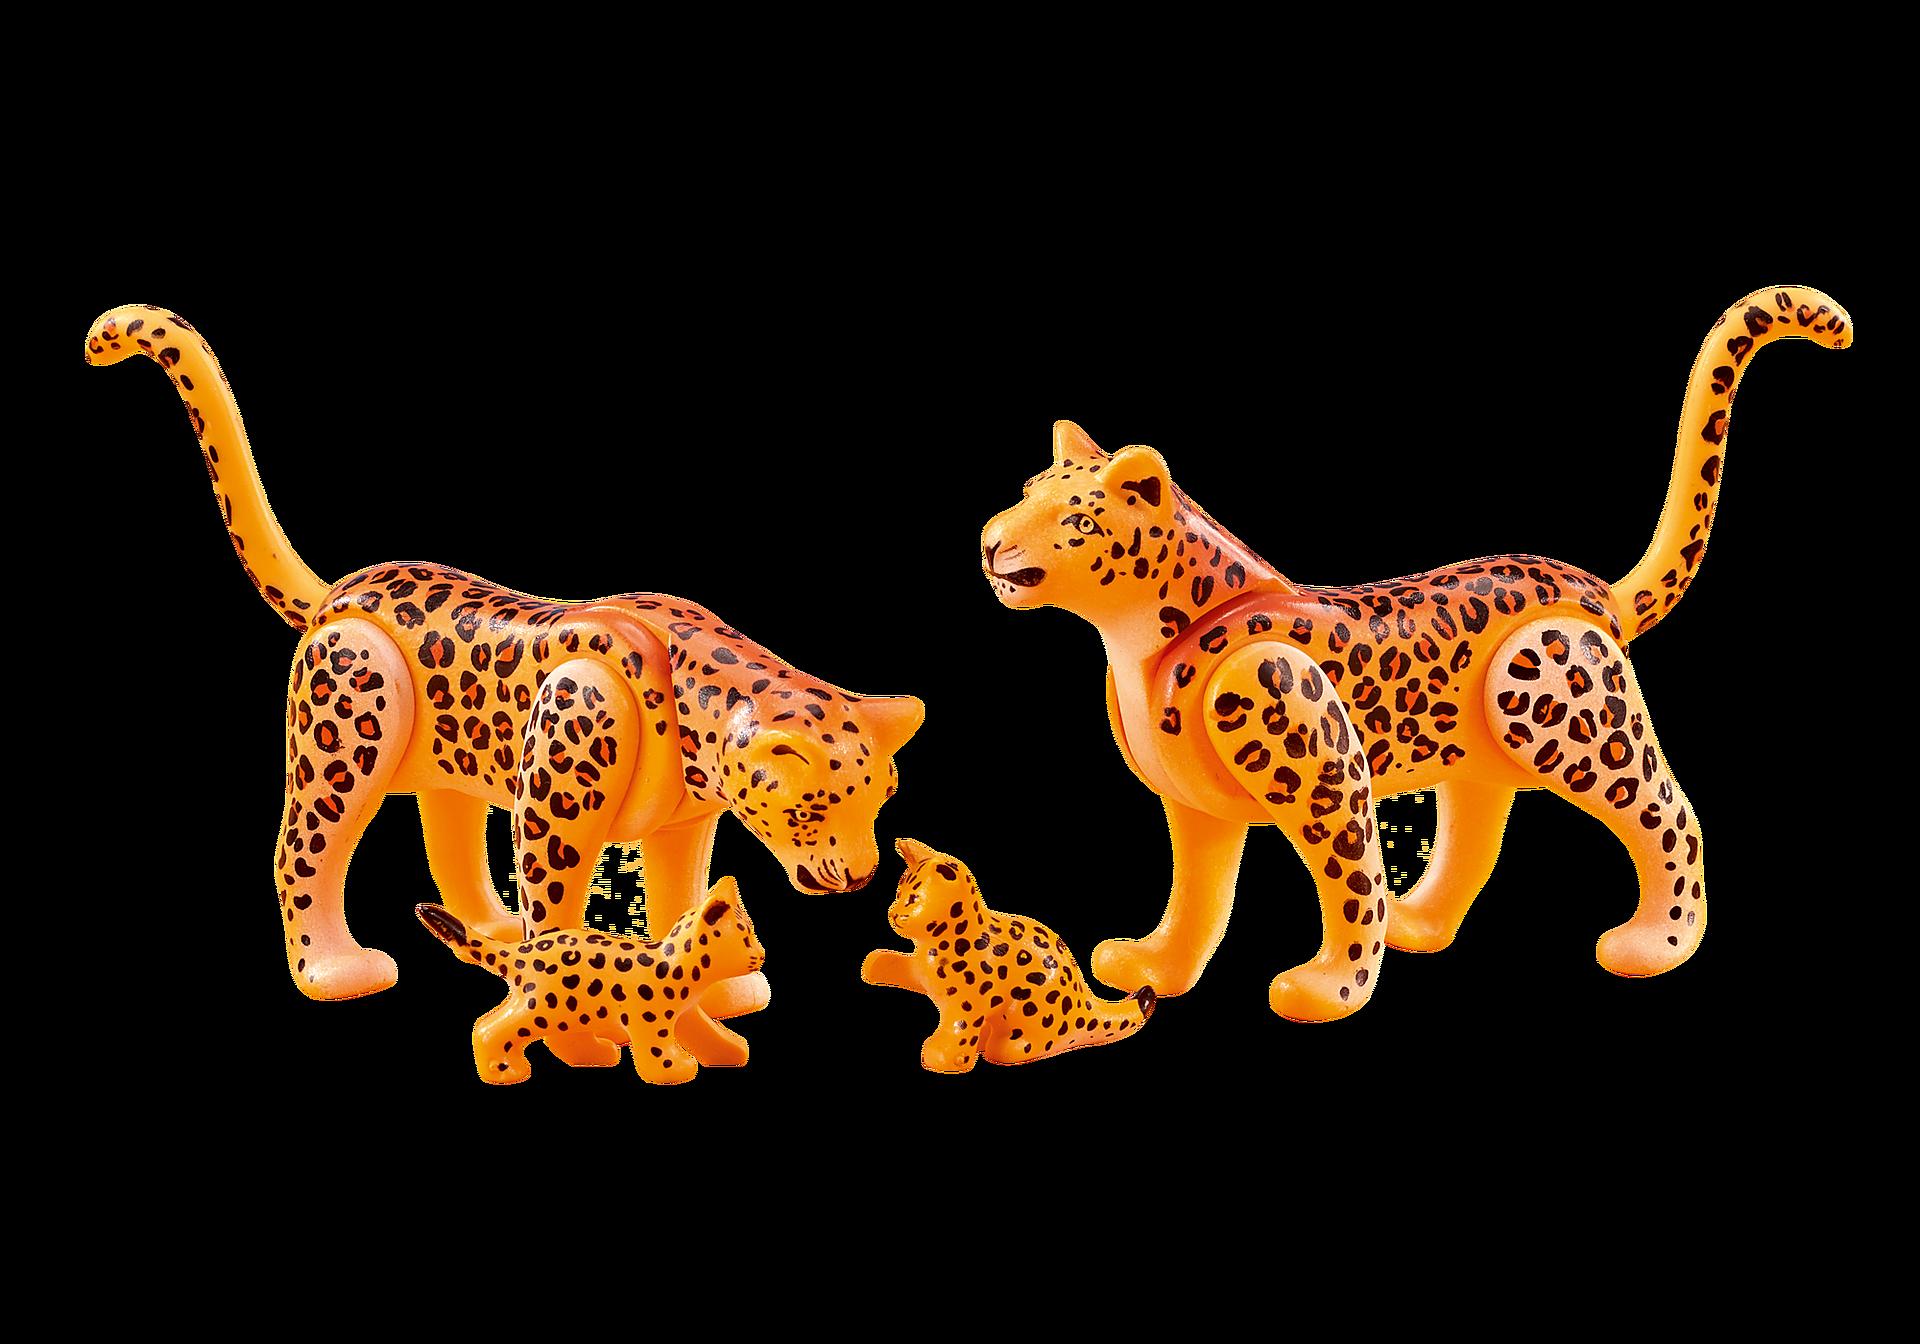 6539 Família de Leopardos zoom image1